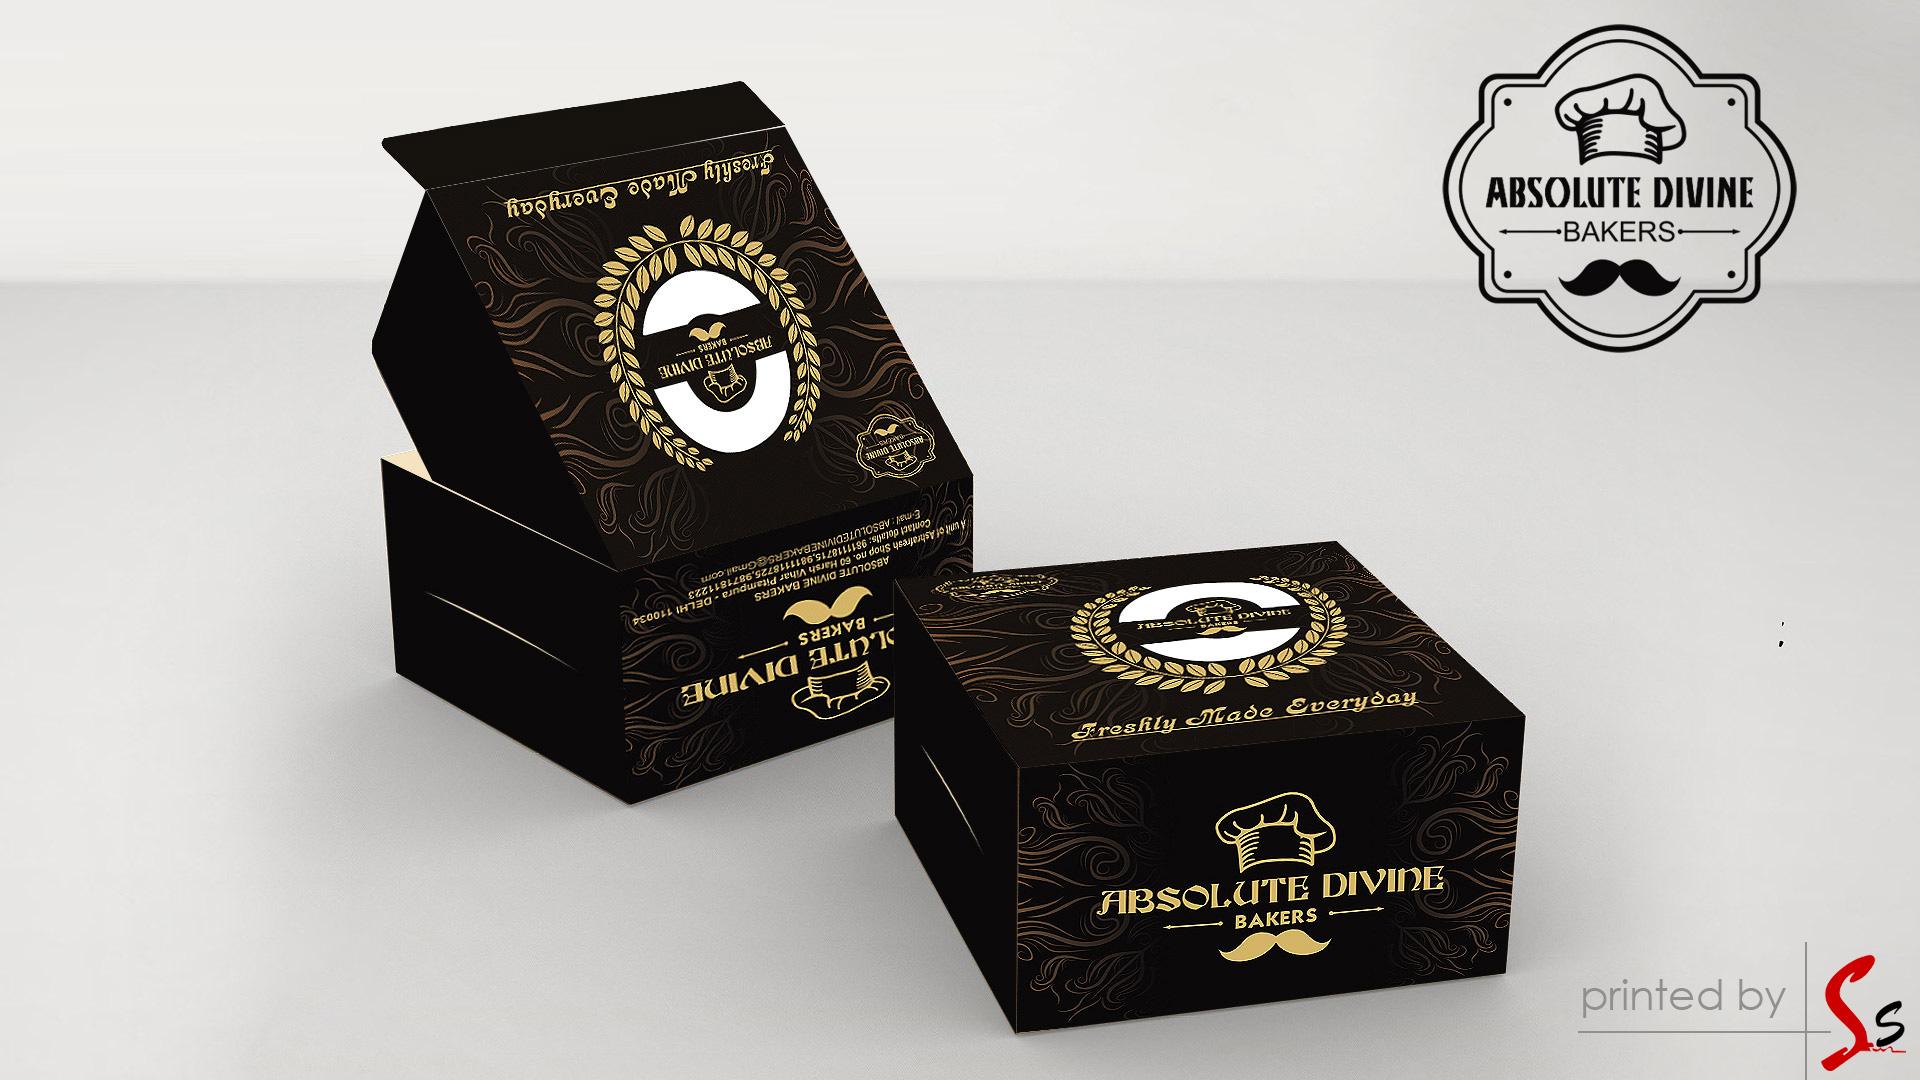 Absolute Divine Cake Box